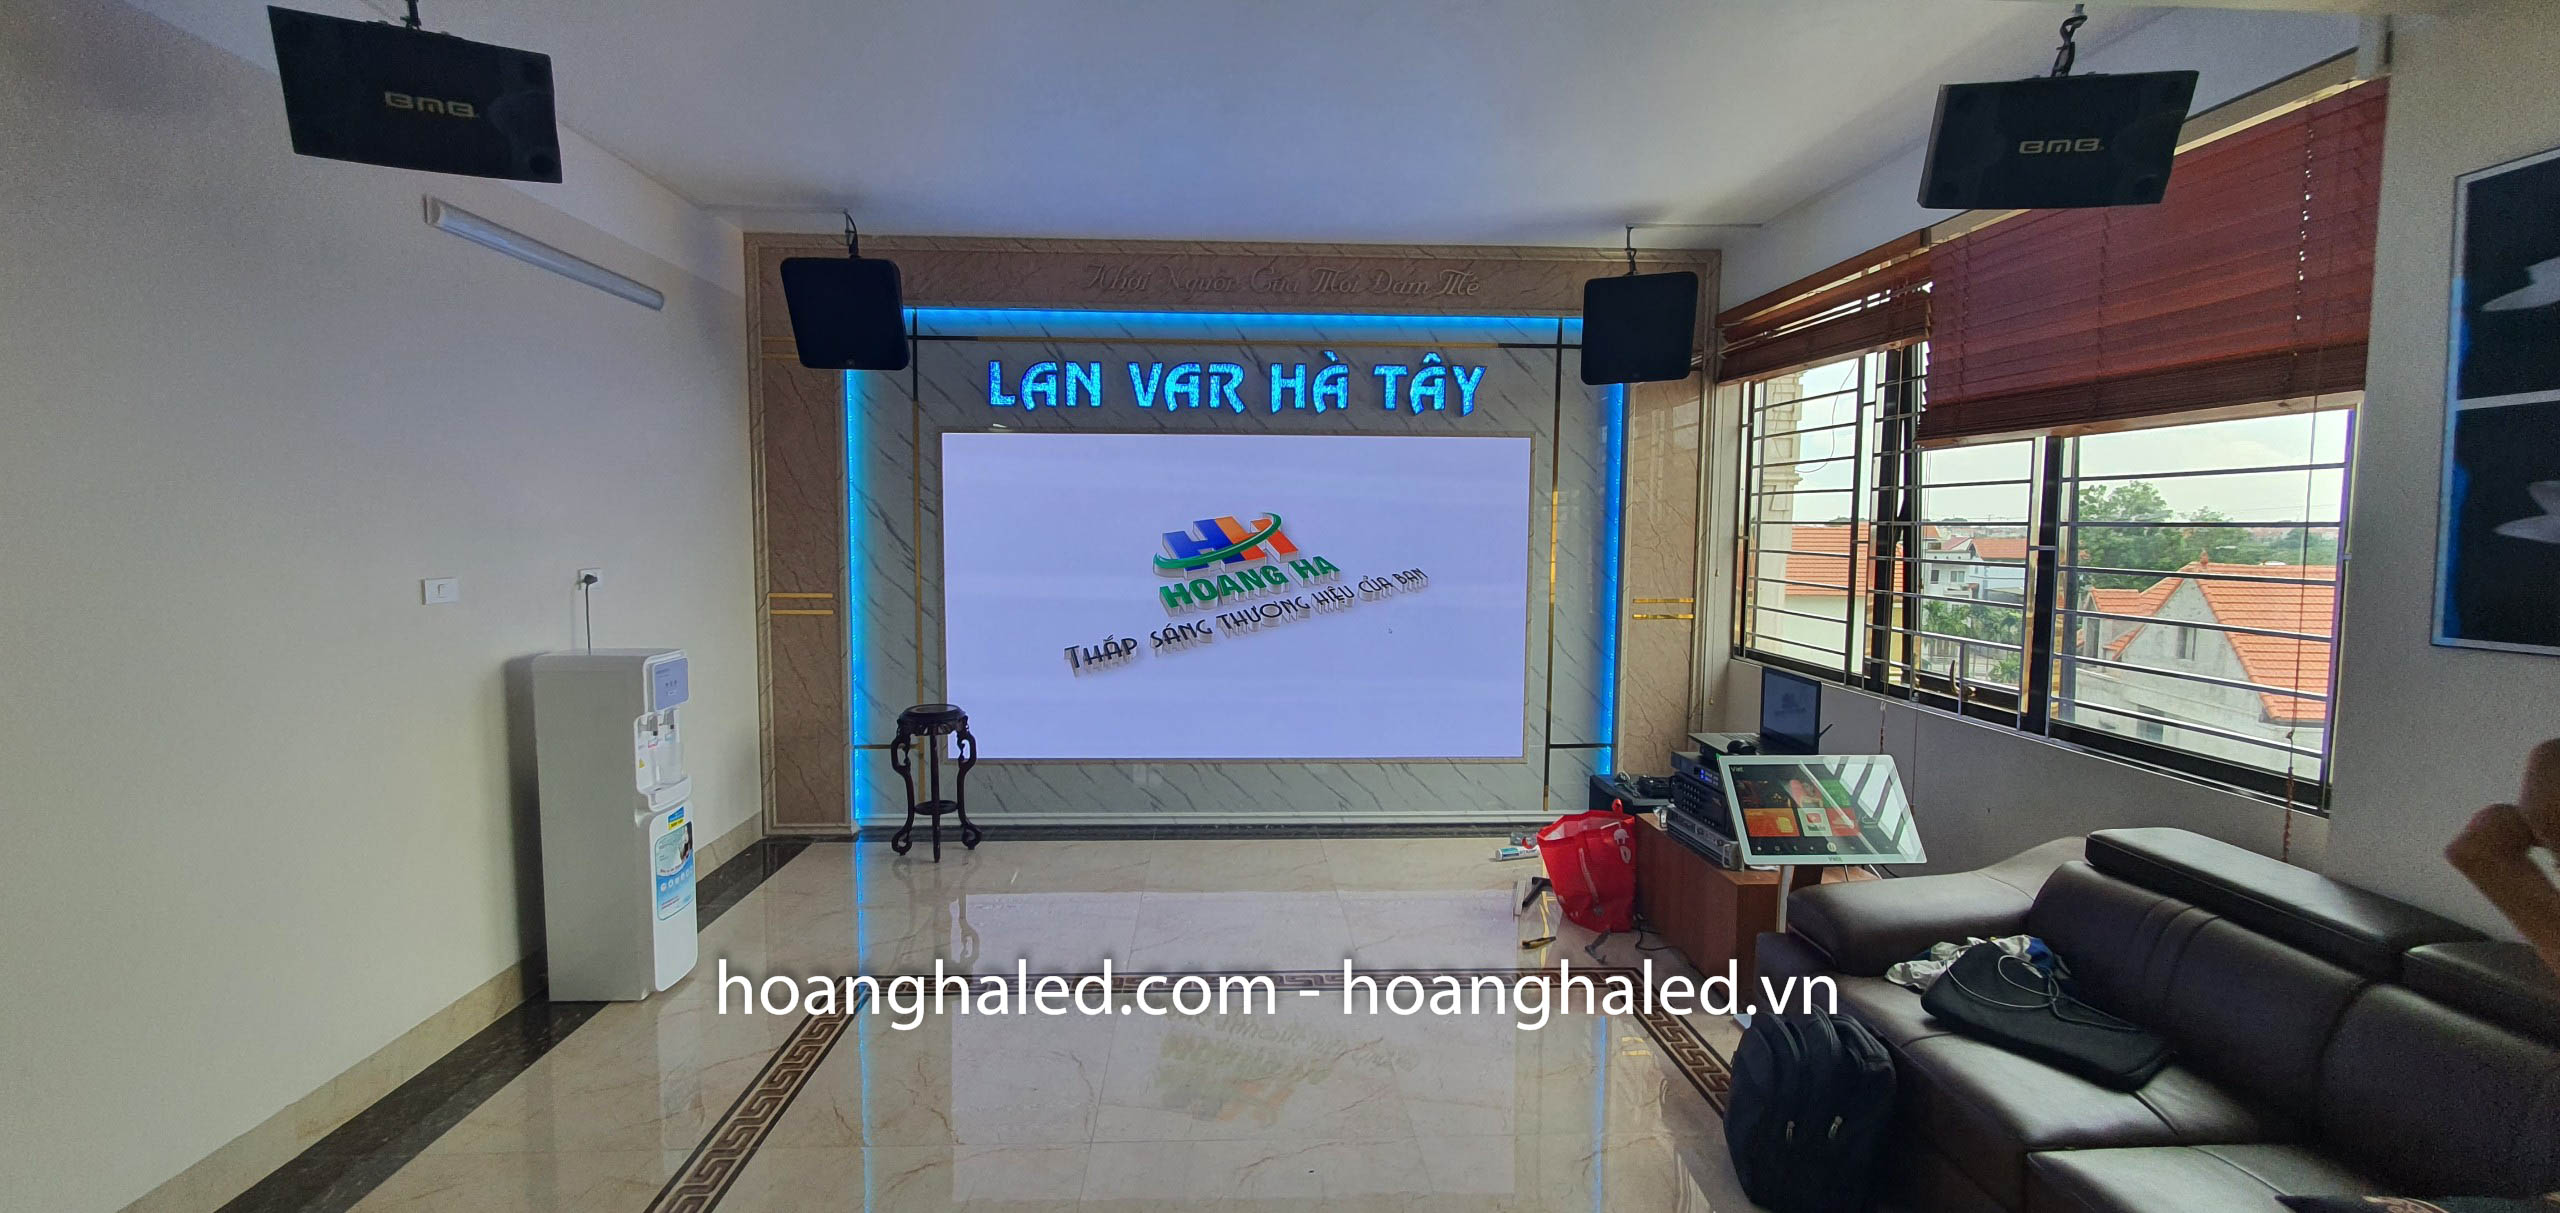 man_hinh_led_p2_trong_nha_tai_lan_var_ha_tay_4